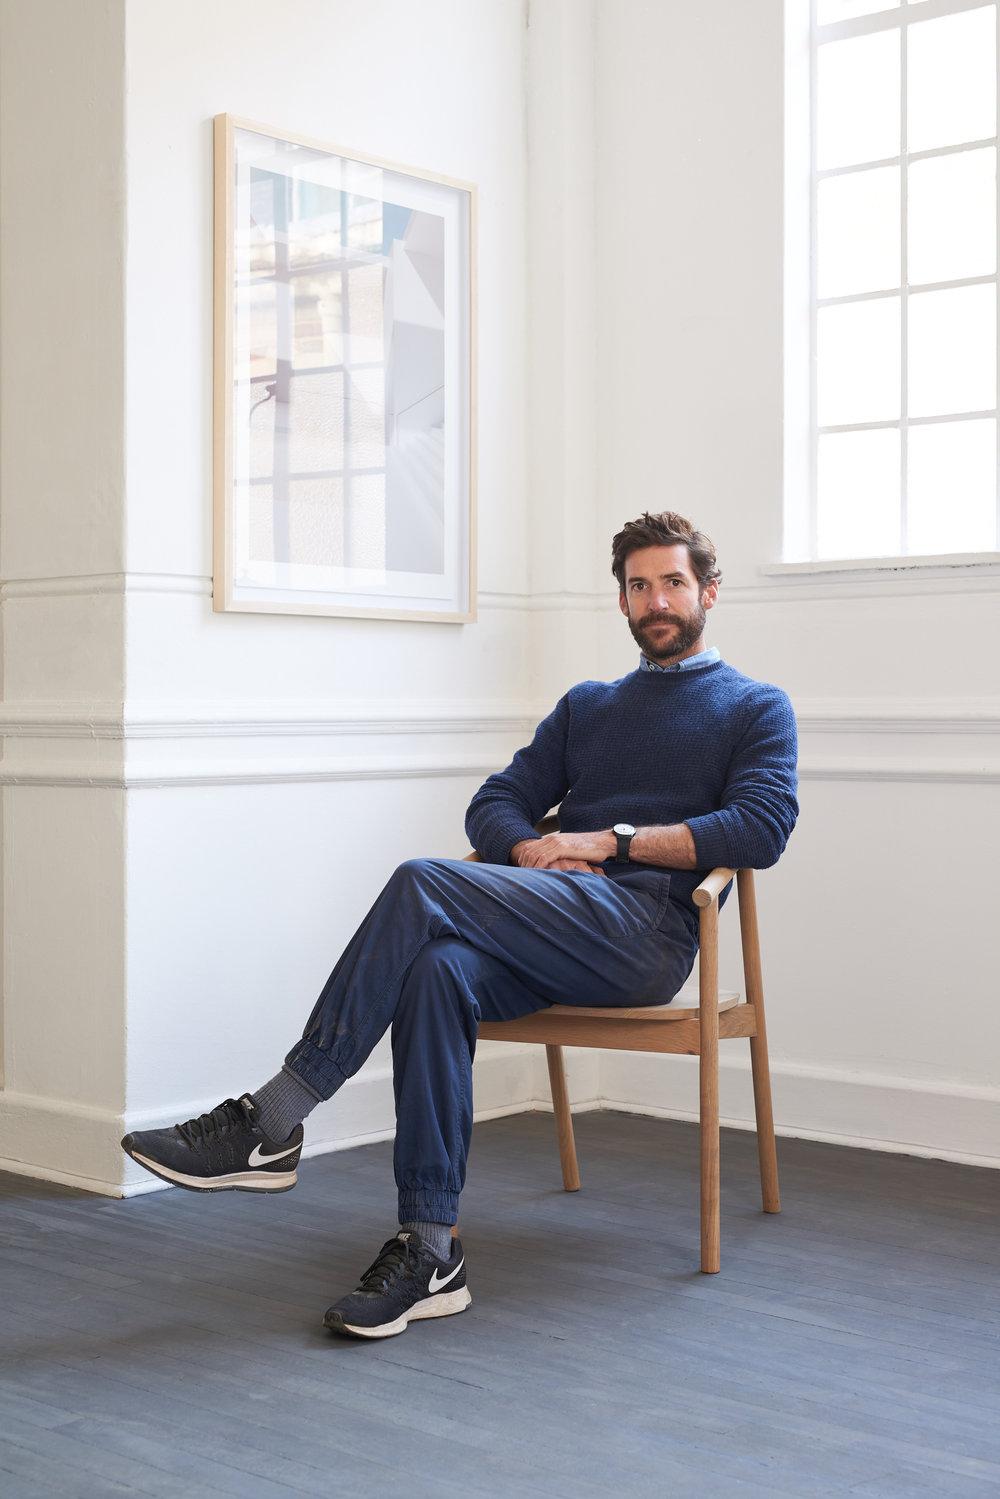 James_Mudge_Hardwood_Chair_02.jpg